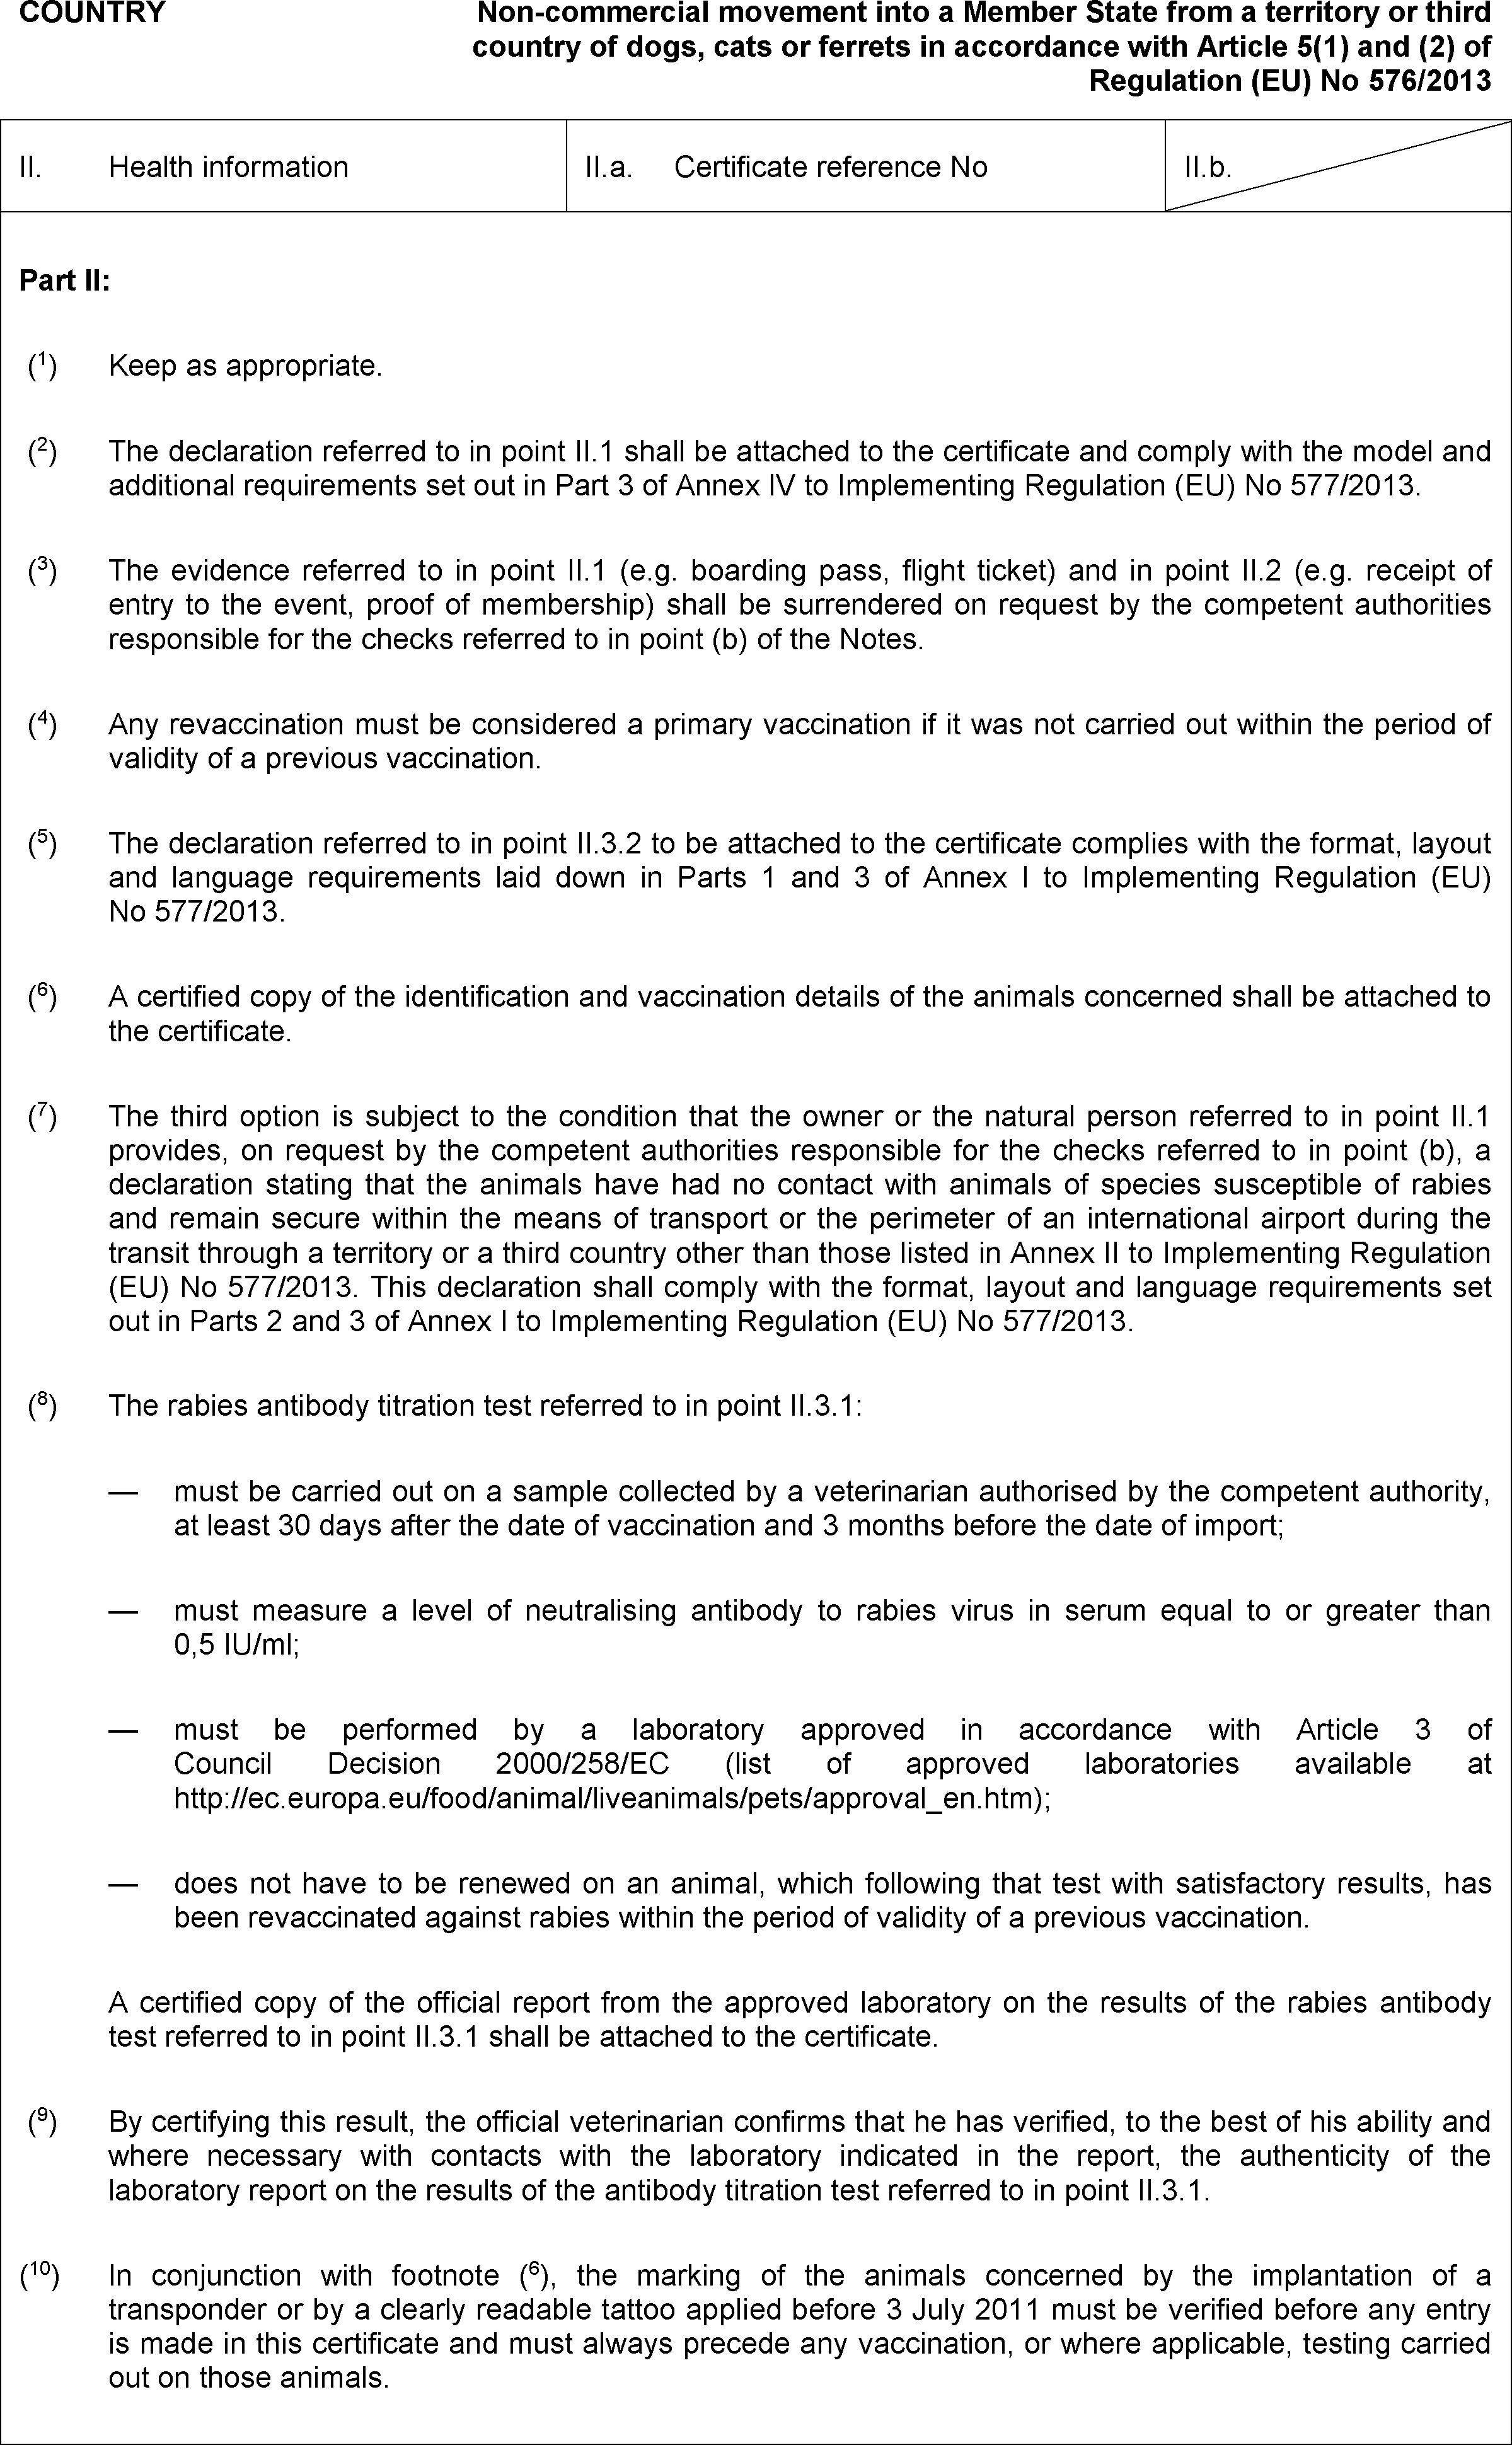 EURLex R EN EURLex - Law documents